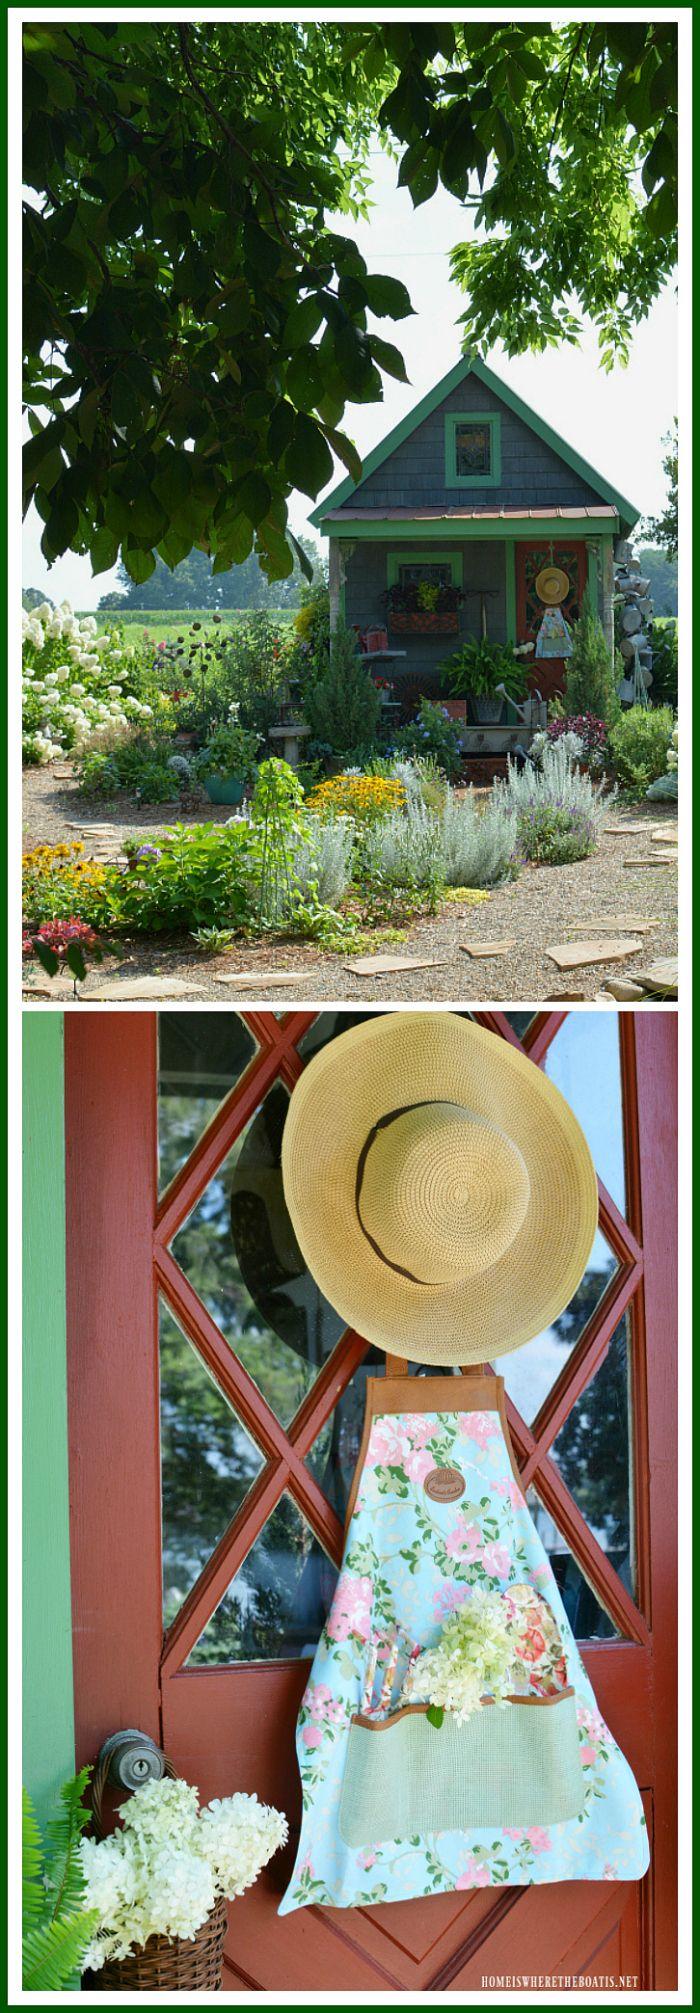 444 best Potting Shed images on Pinterest   Potting benches, Potting ...